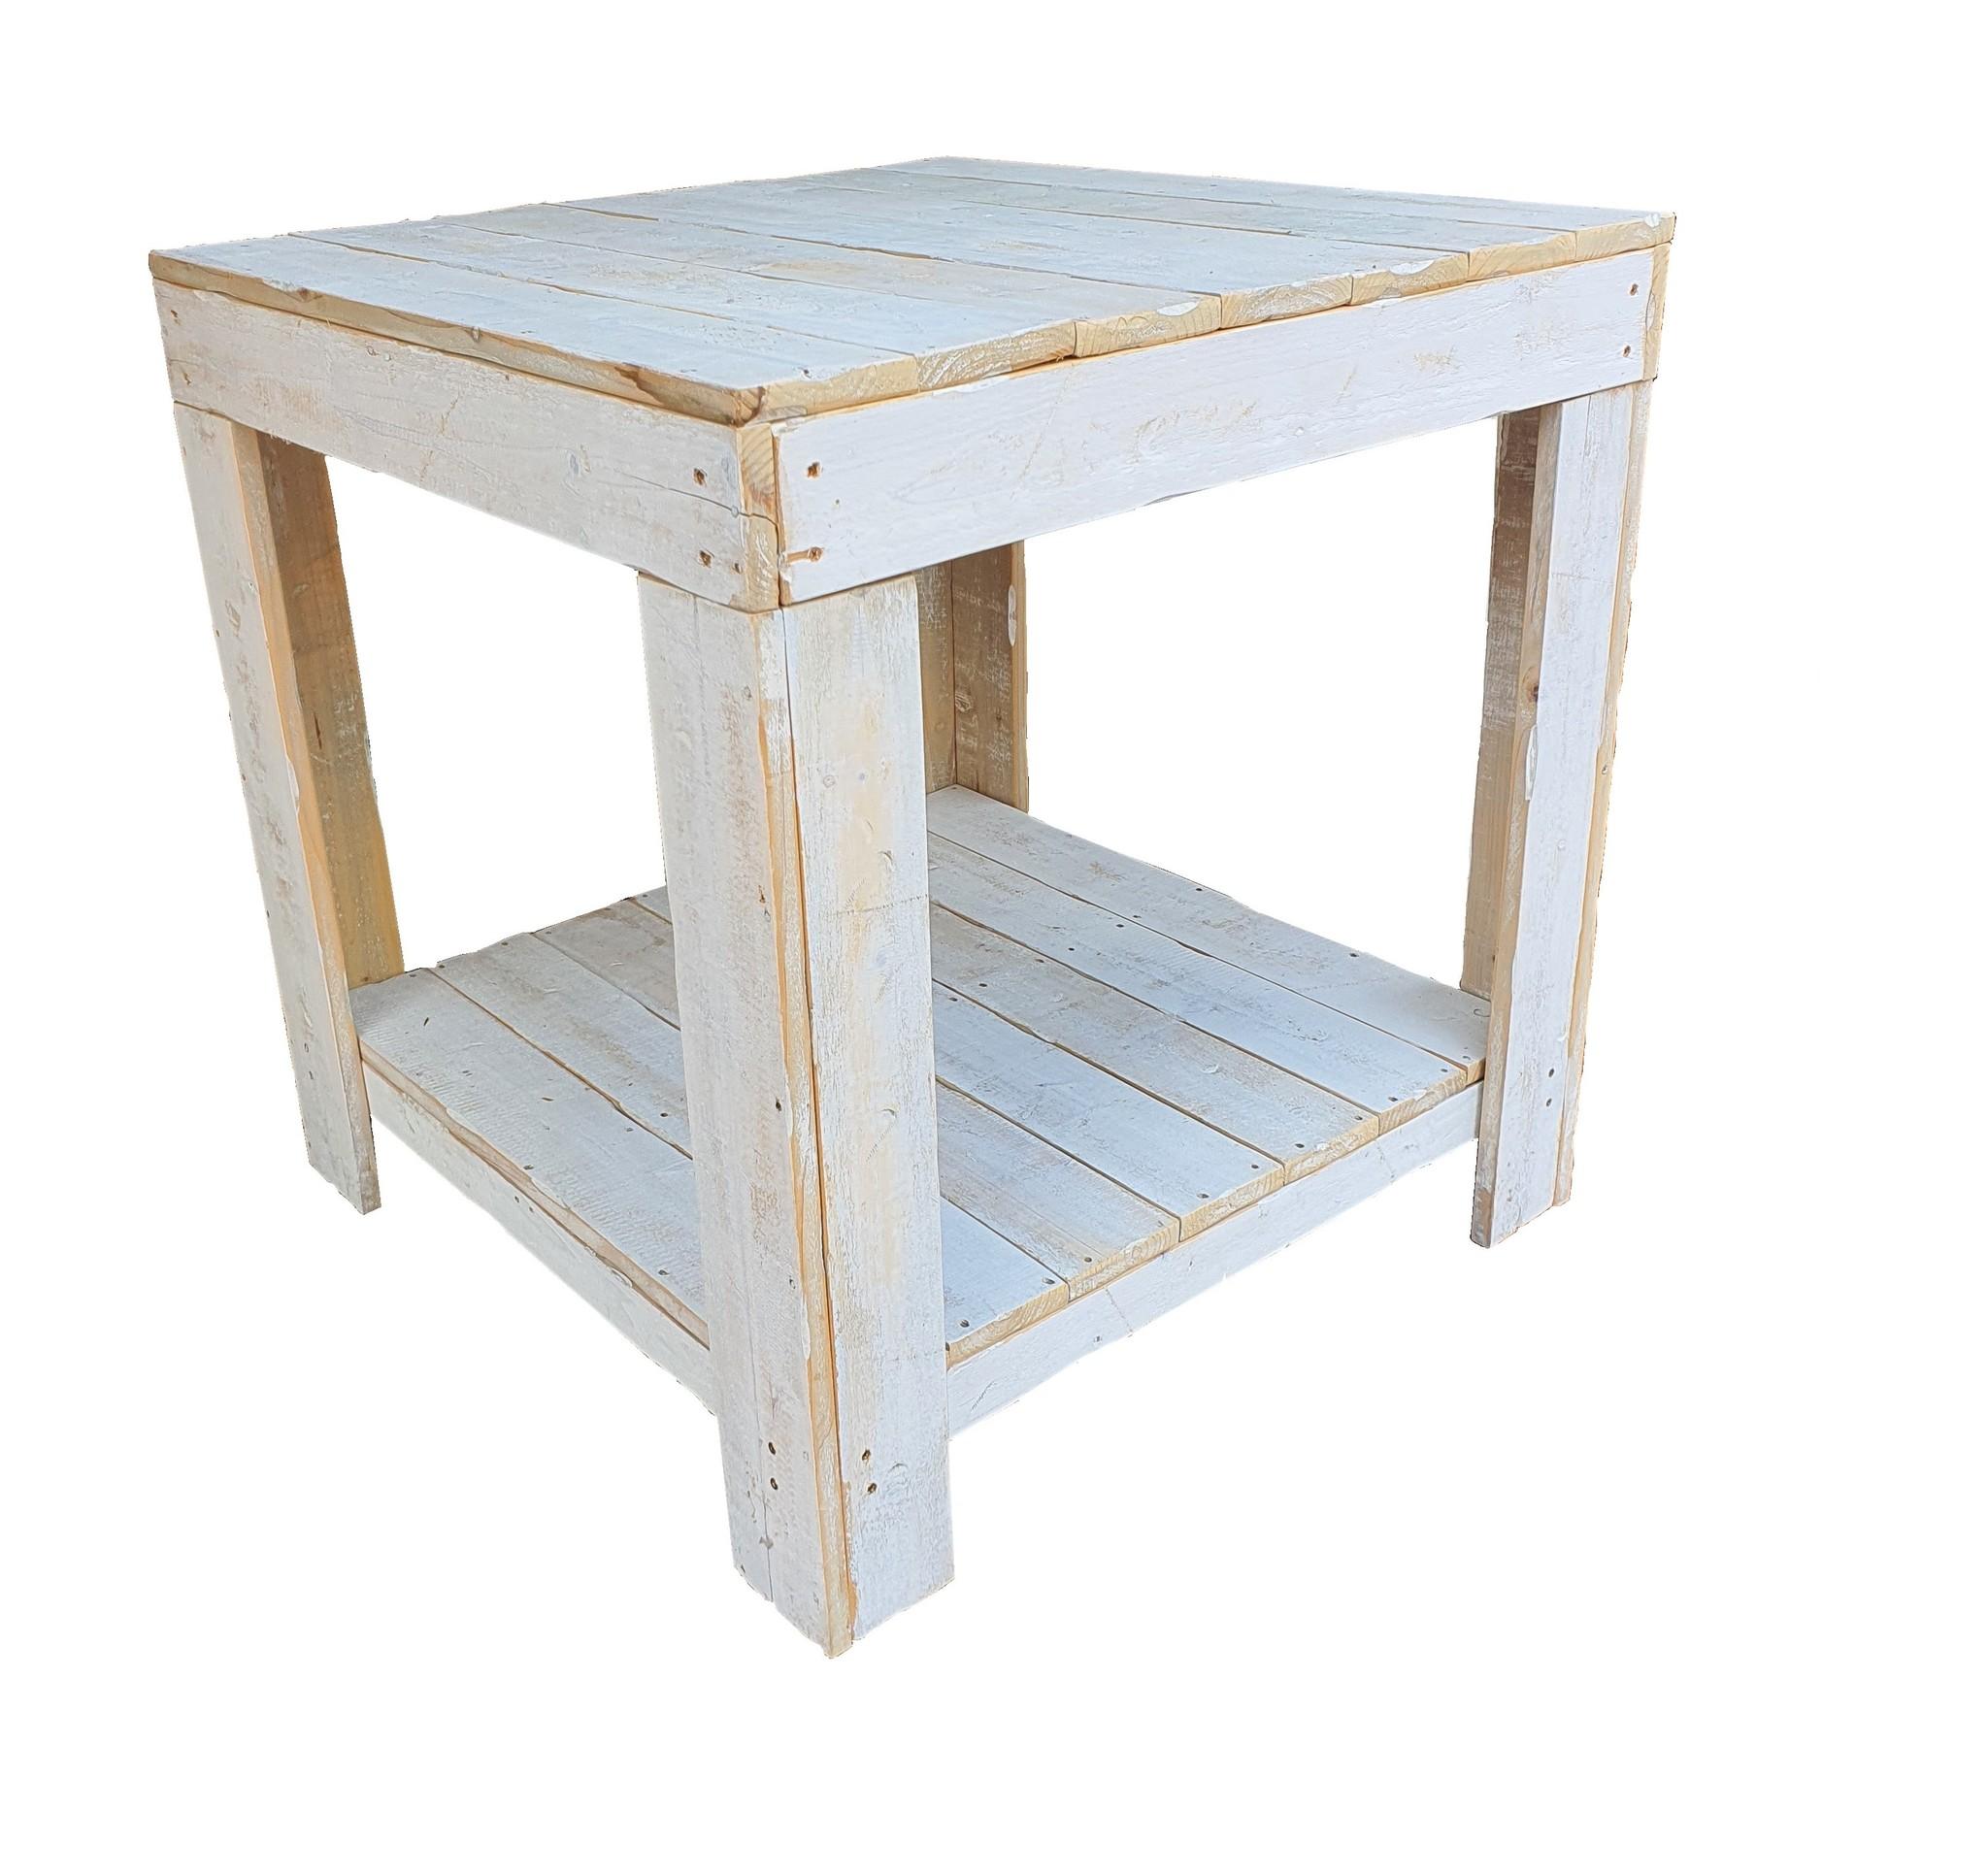 shop int ibiza white table double 78-3